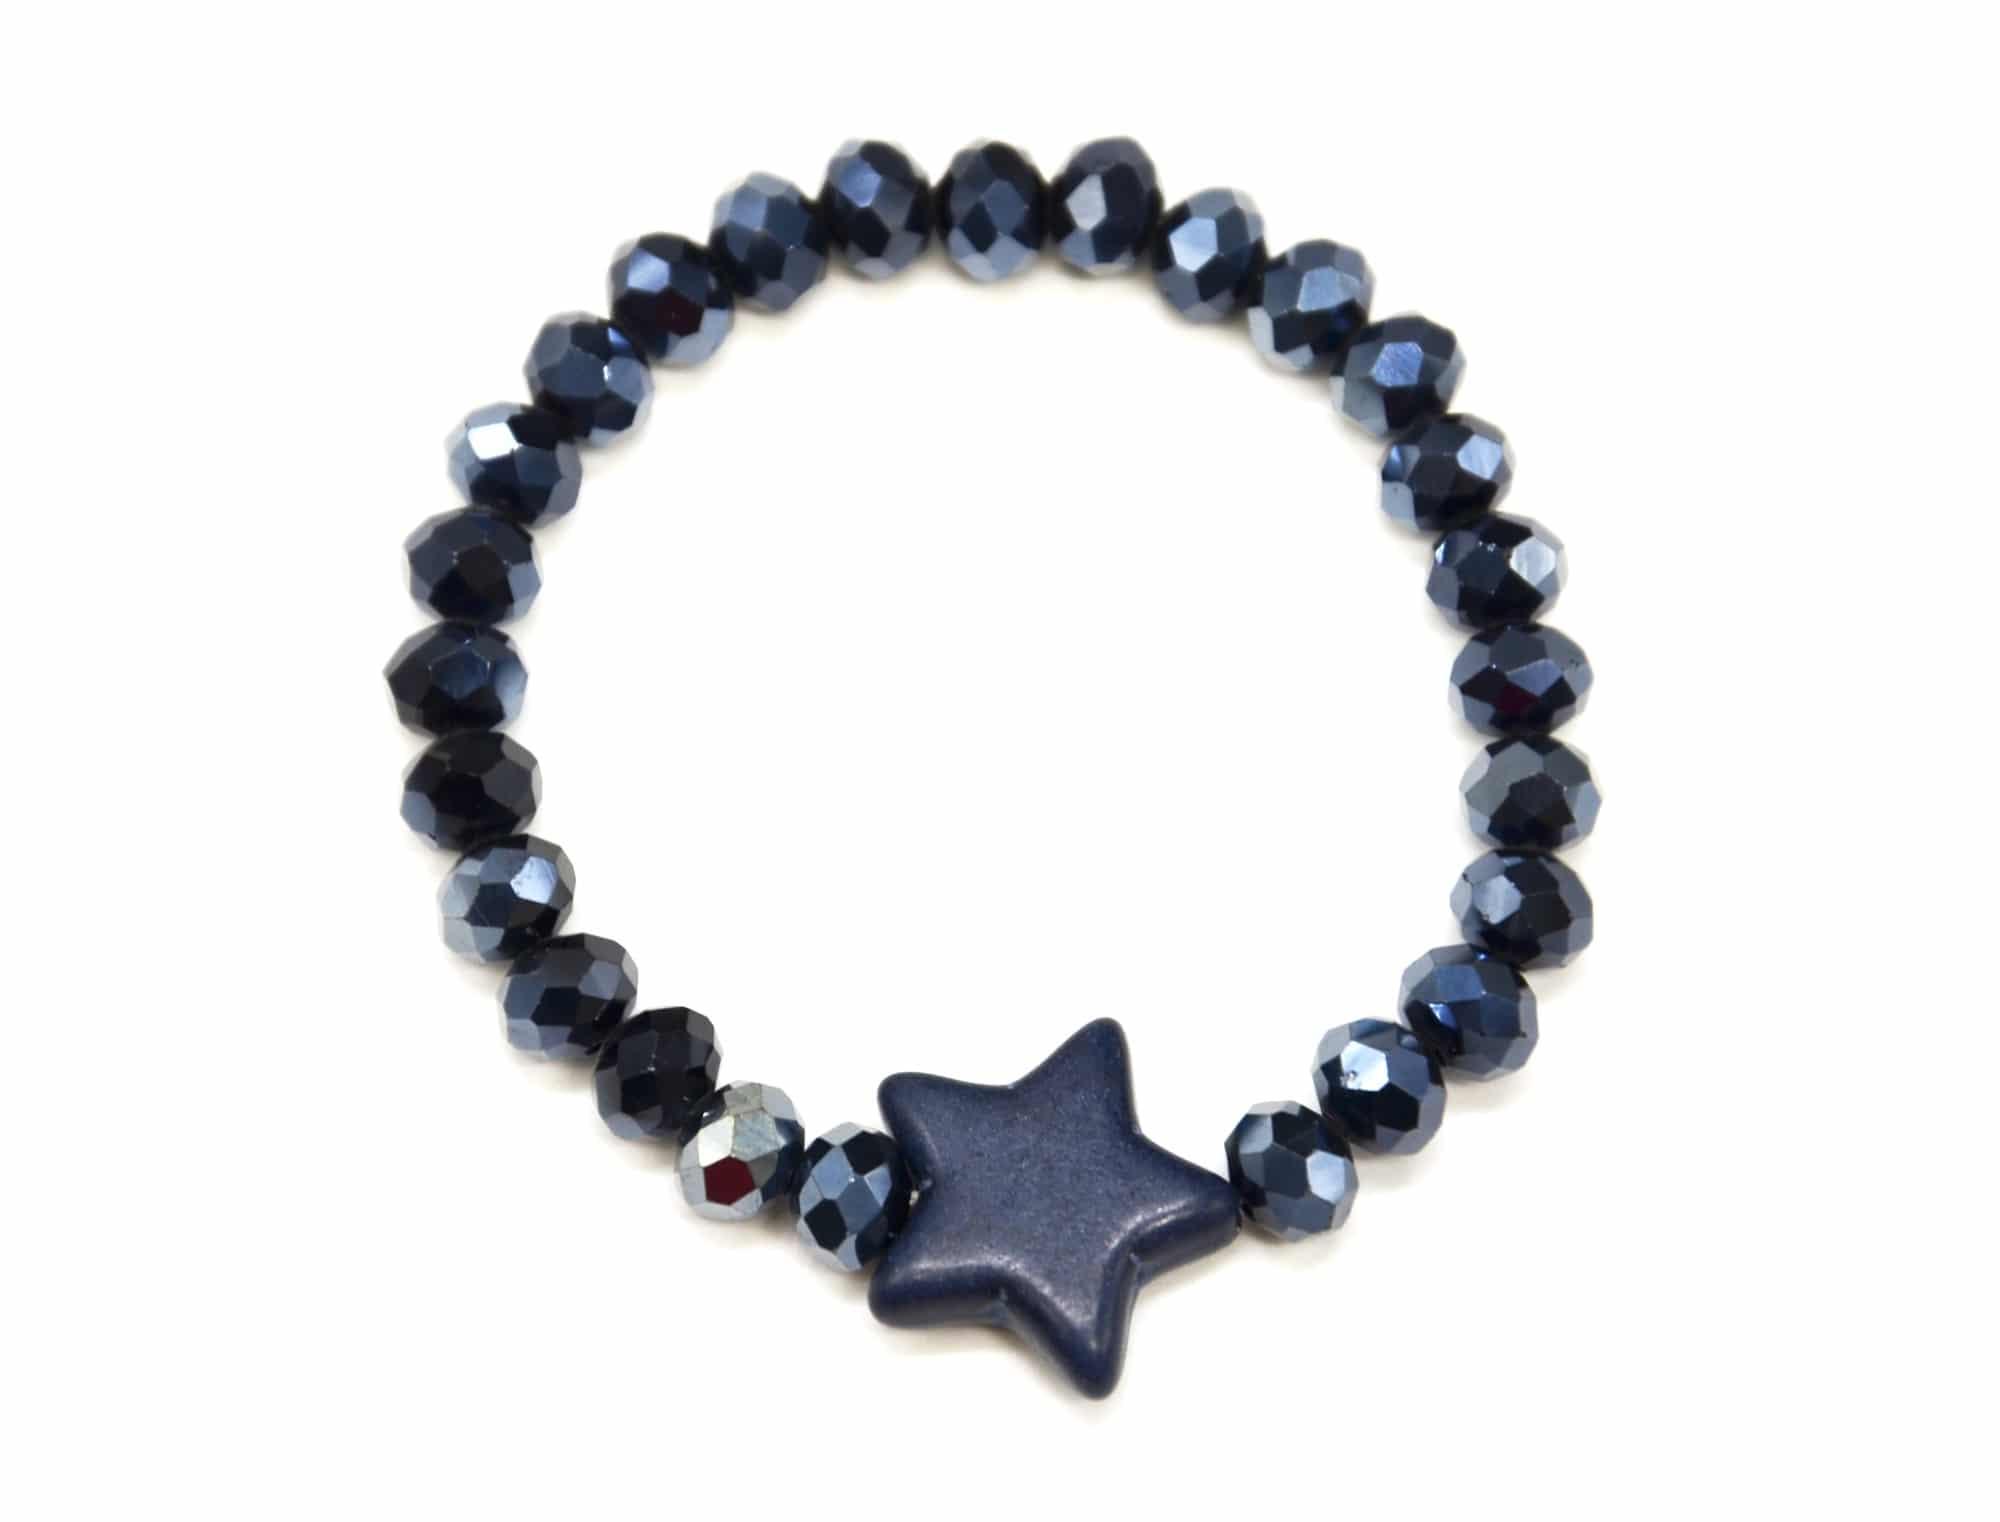 bc2670f bracelet elastique perles brillantes avec charm. Black Bedroom Furniture Sets. Home Design Ideas